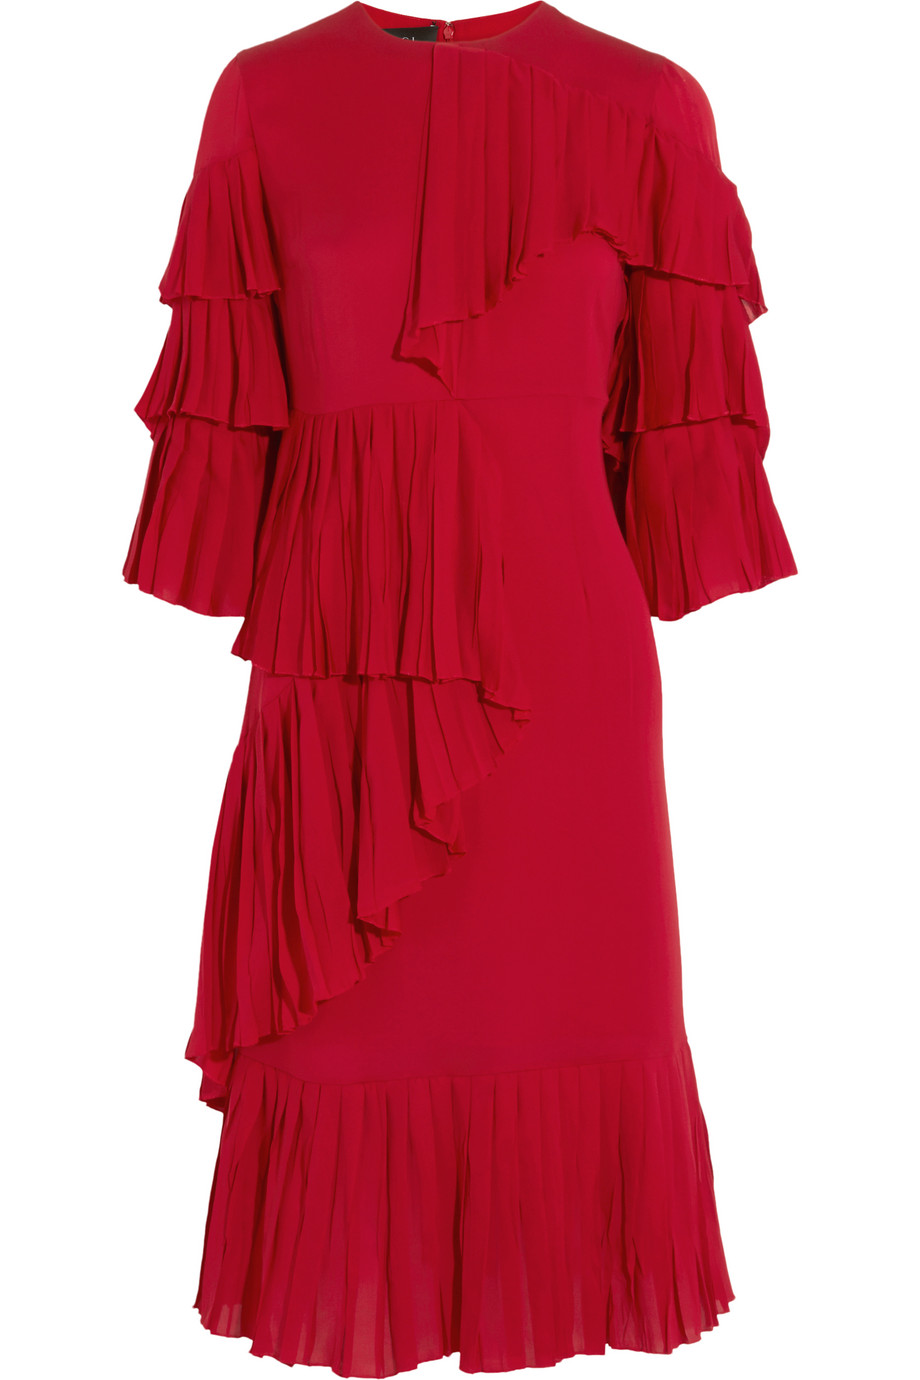 Gucci Ruffled Silk-Georgette Dress, Red, Women's, Size: 42